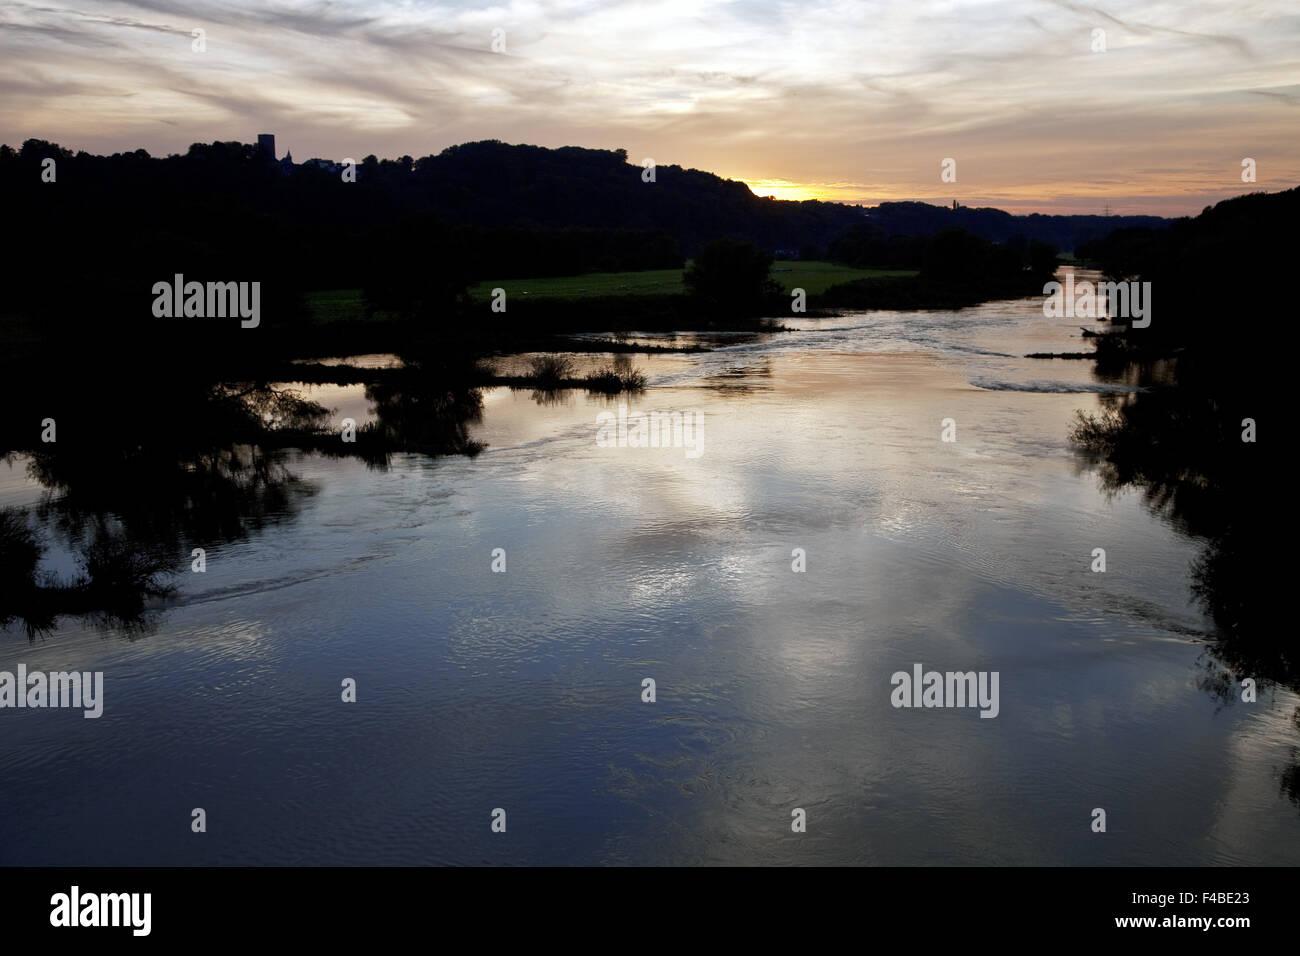 Ruhr Valley, Hattingen, Germany. - Stock Image